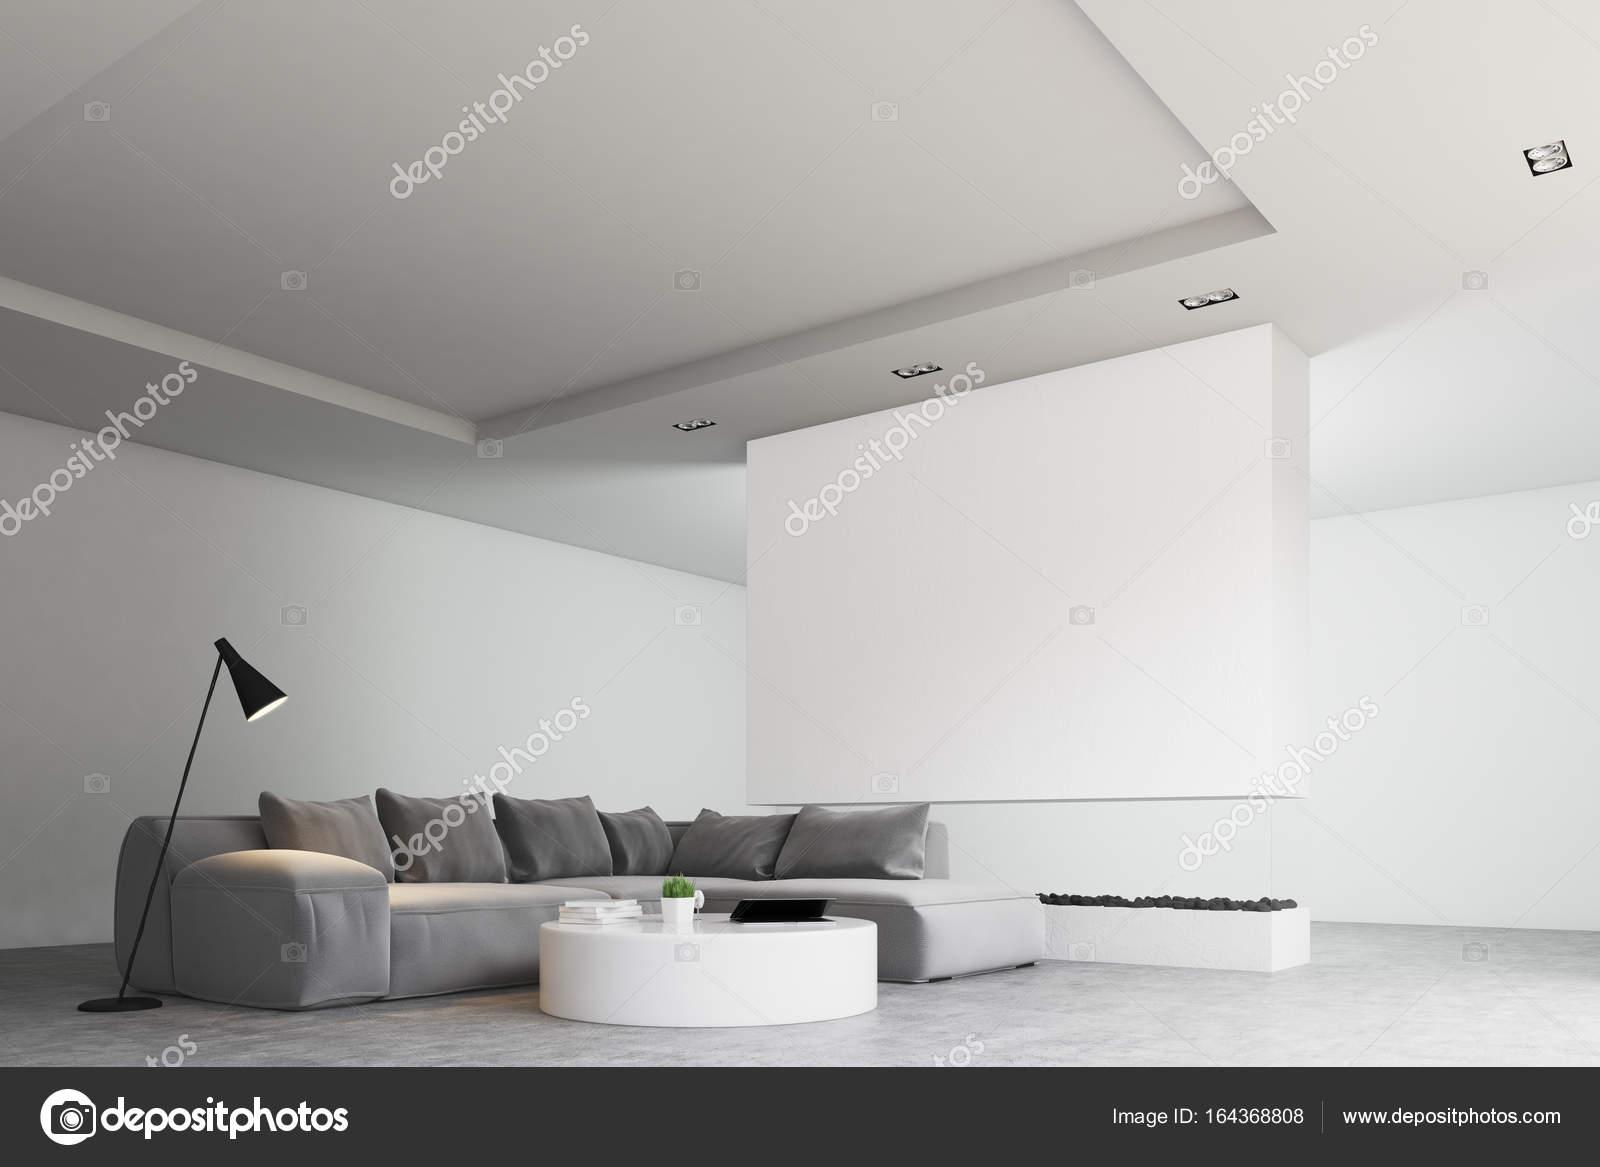 https://st3.depositphotos.com/2673929/16436/i/1600/depositphotos_164368808-stockafbeelding-woonkamer-ronde-tafel-bank-kant.jpg